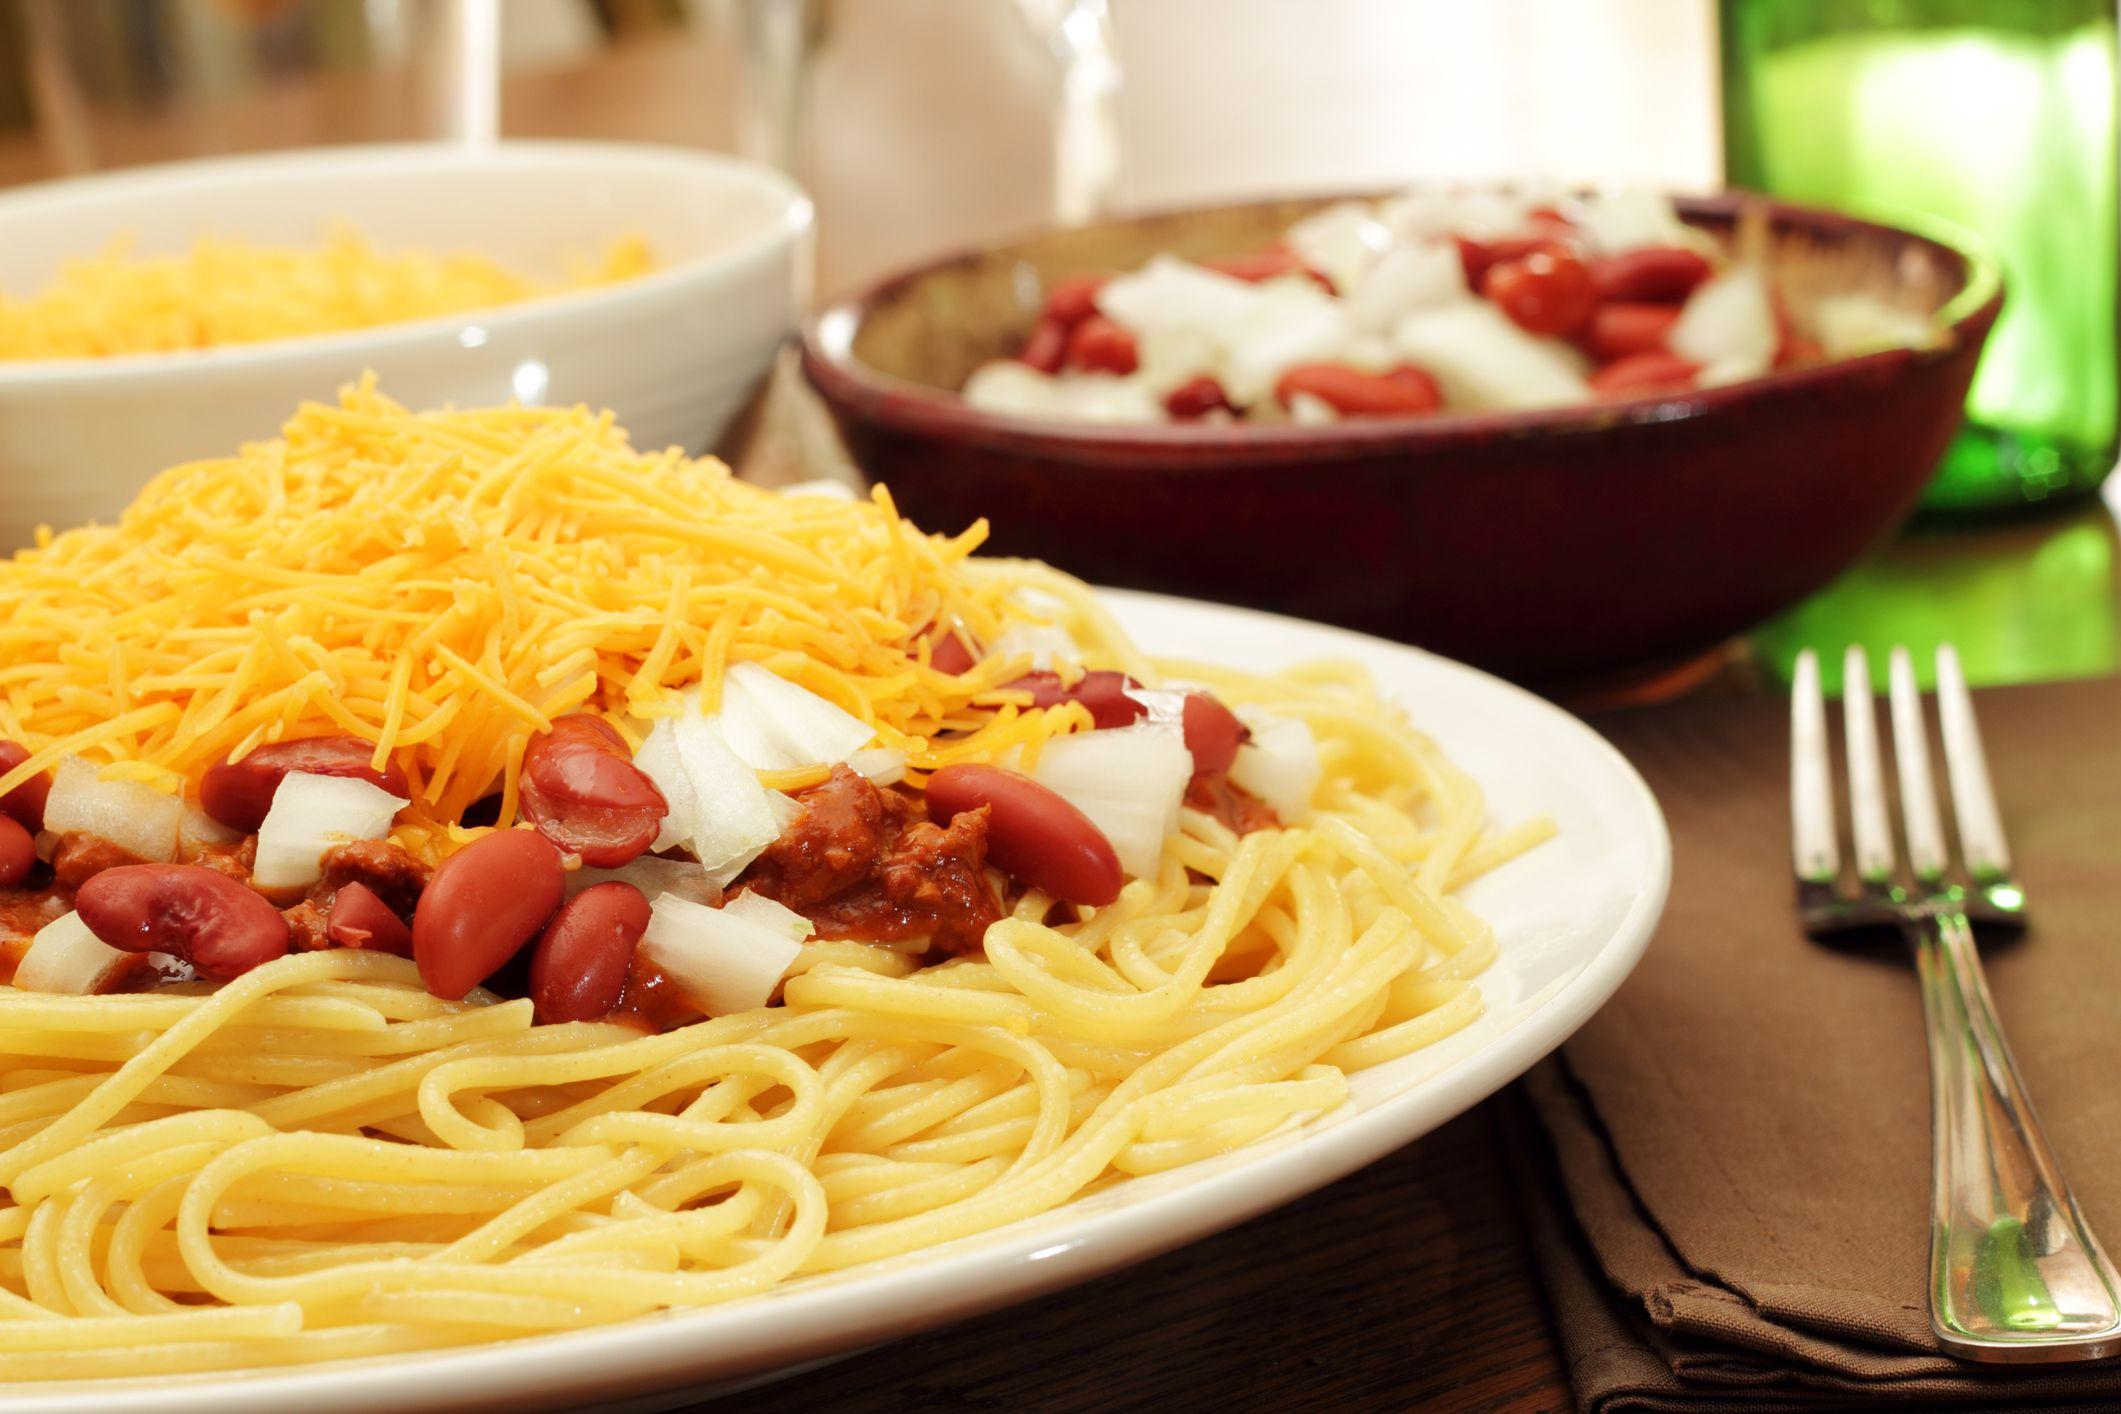 7 Local Foods You Need to Eat in Cincinnati